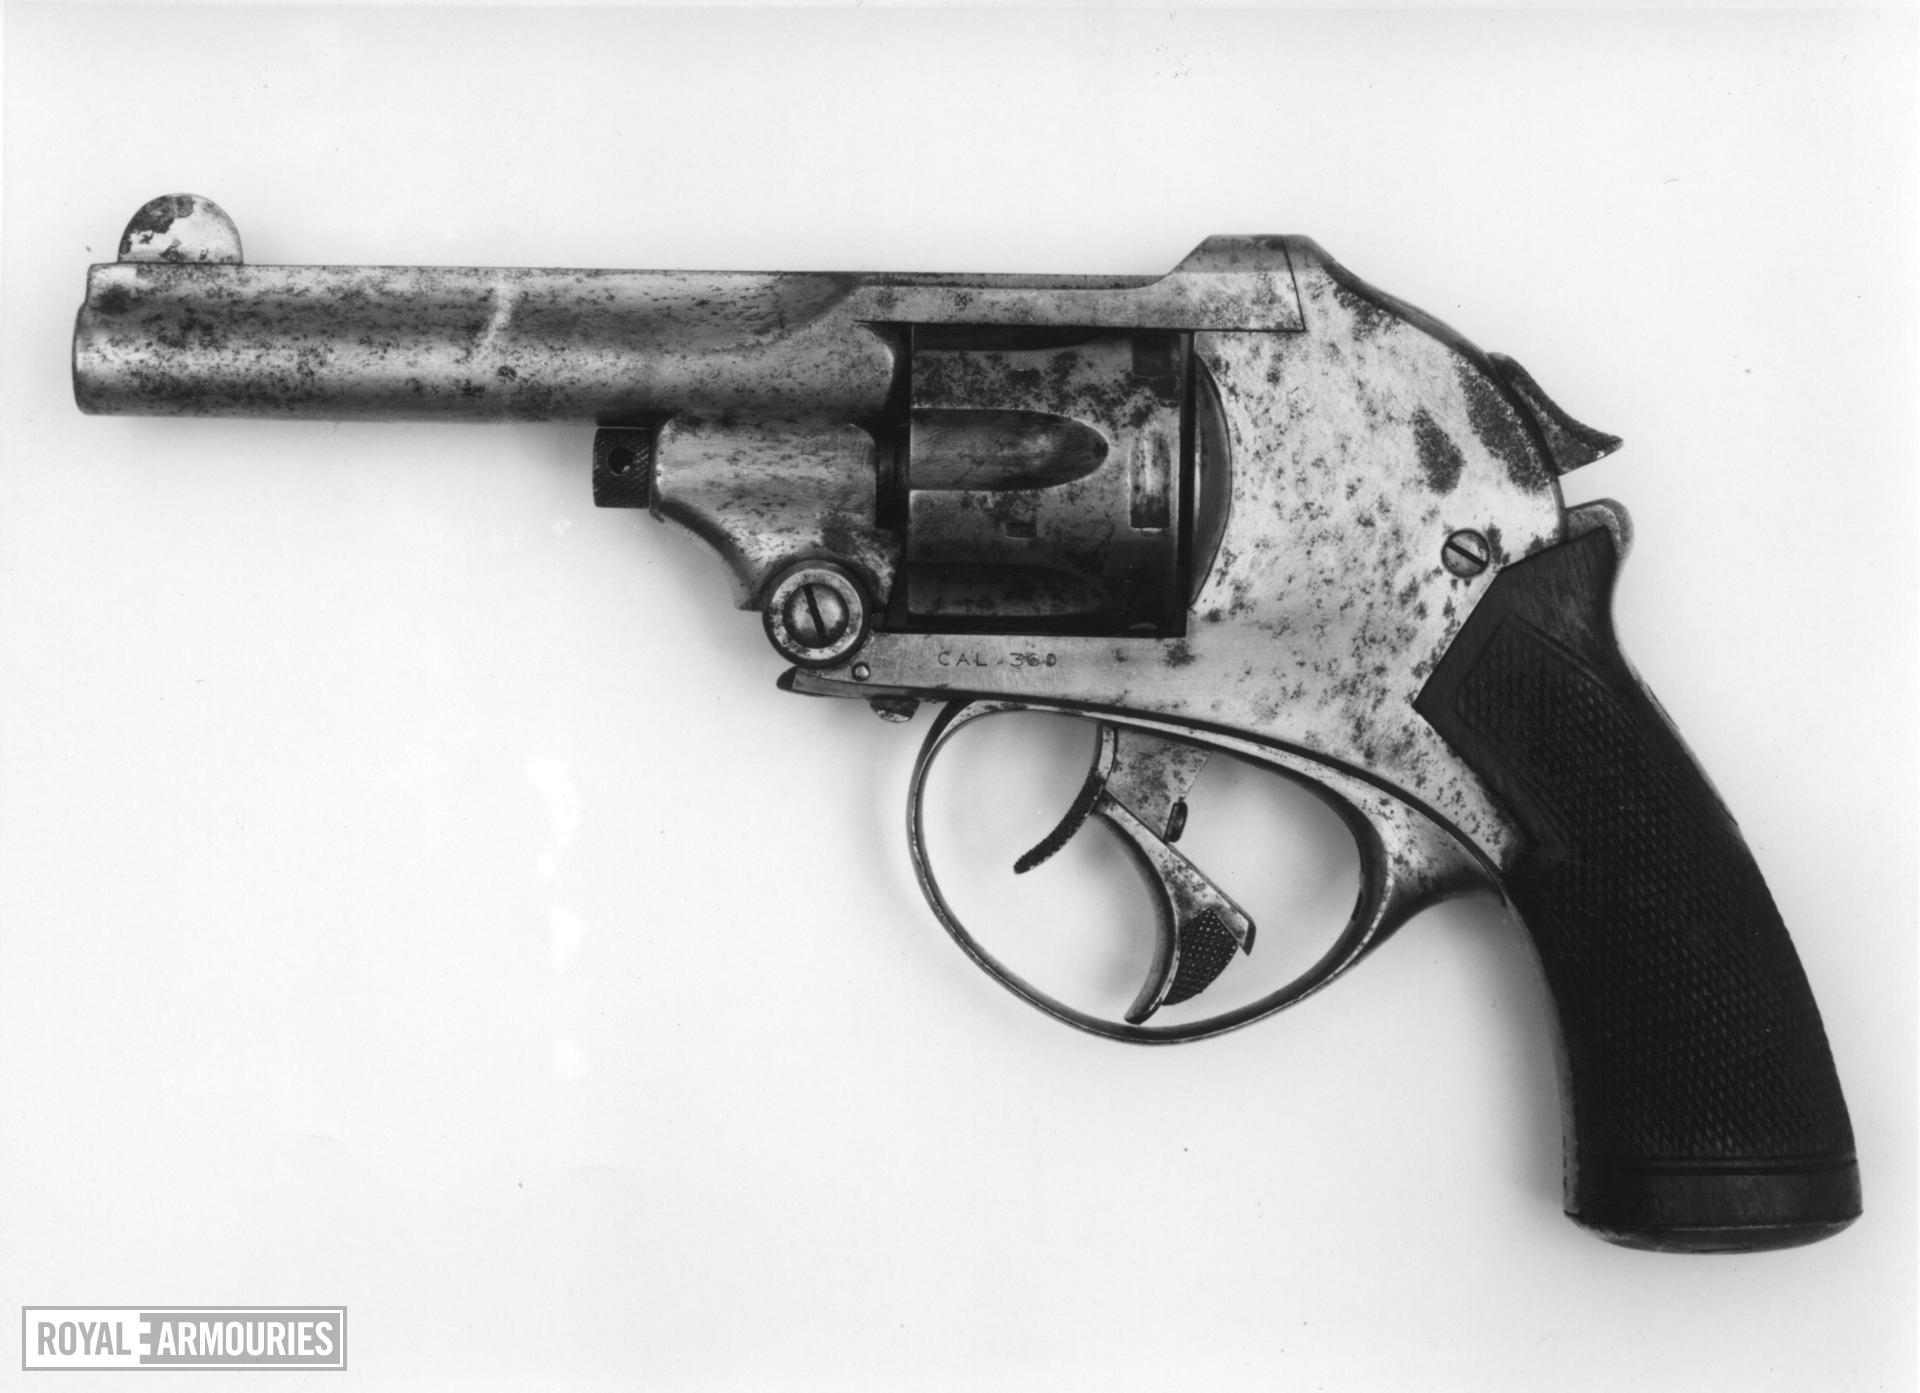 Centrefire six-shot revolver - Kynock Pocket Model